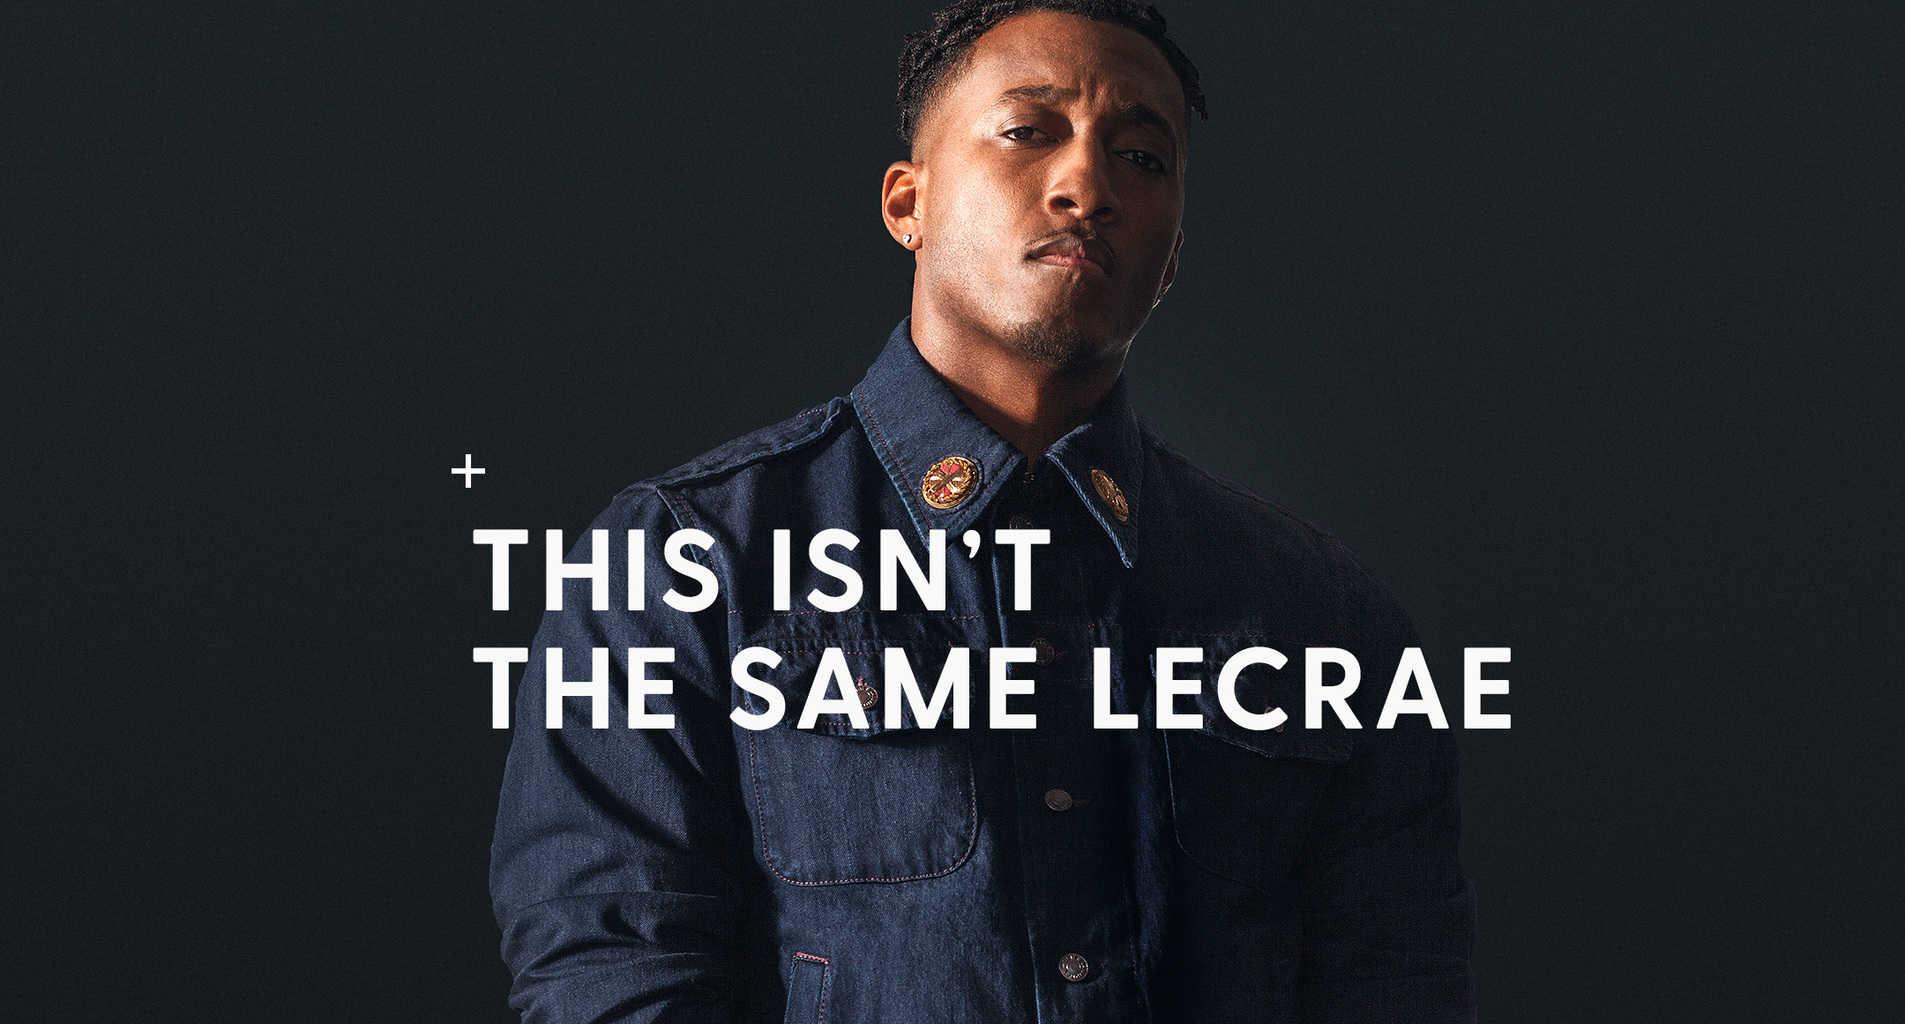 This Isn't The Same Lecrae | RELEVANT Magazine